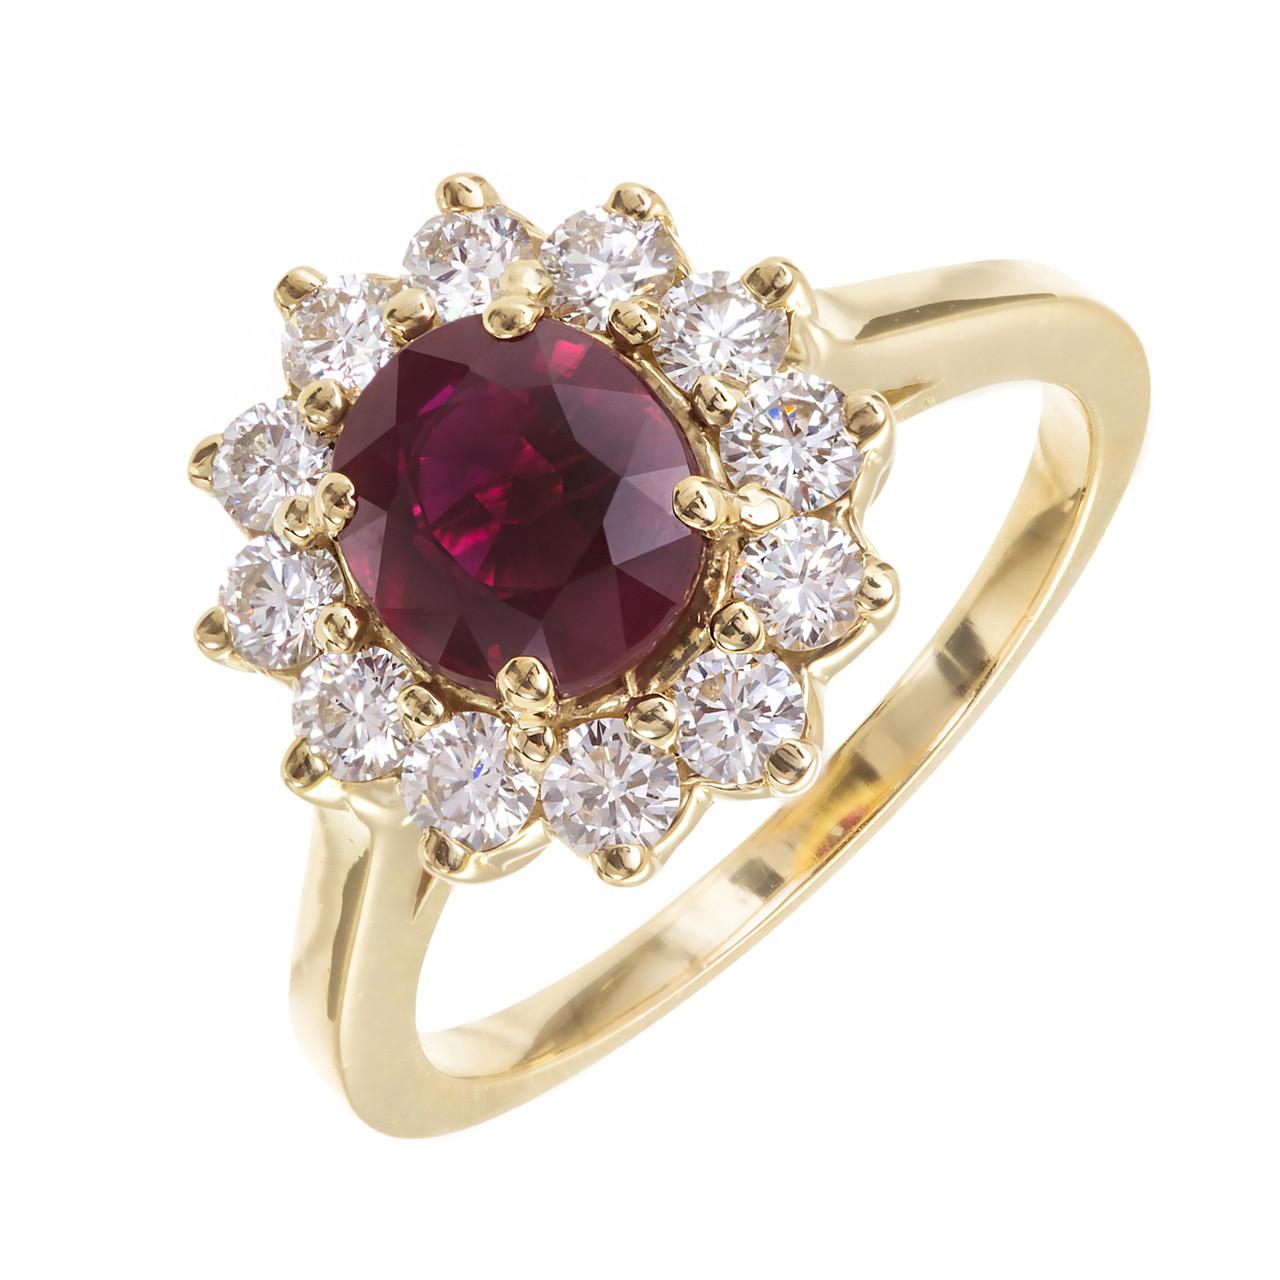 5a2706e8f Vintage Blood Red Burma Ruby 18k Gold Diamond Ring - petersuchyjewelers